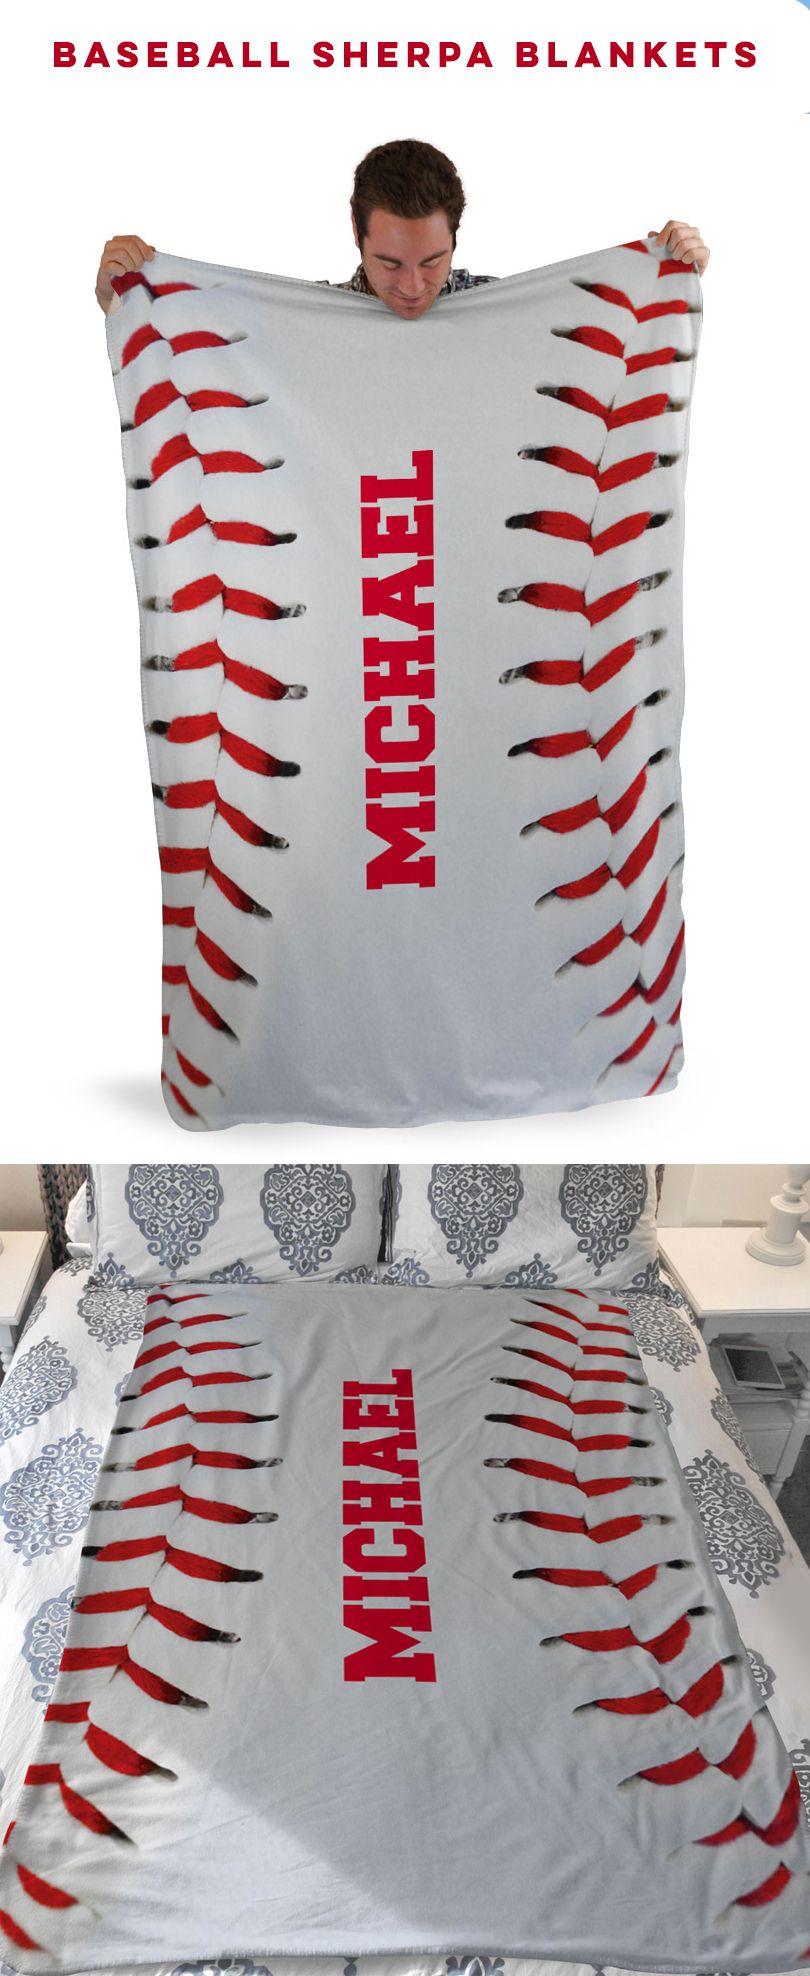 custom baseball stitches sherpa fleece blanket a great baseball